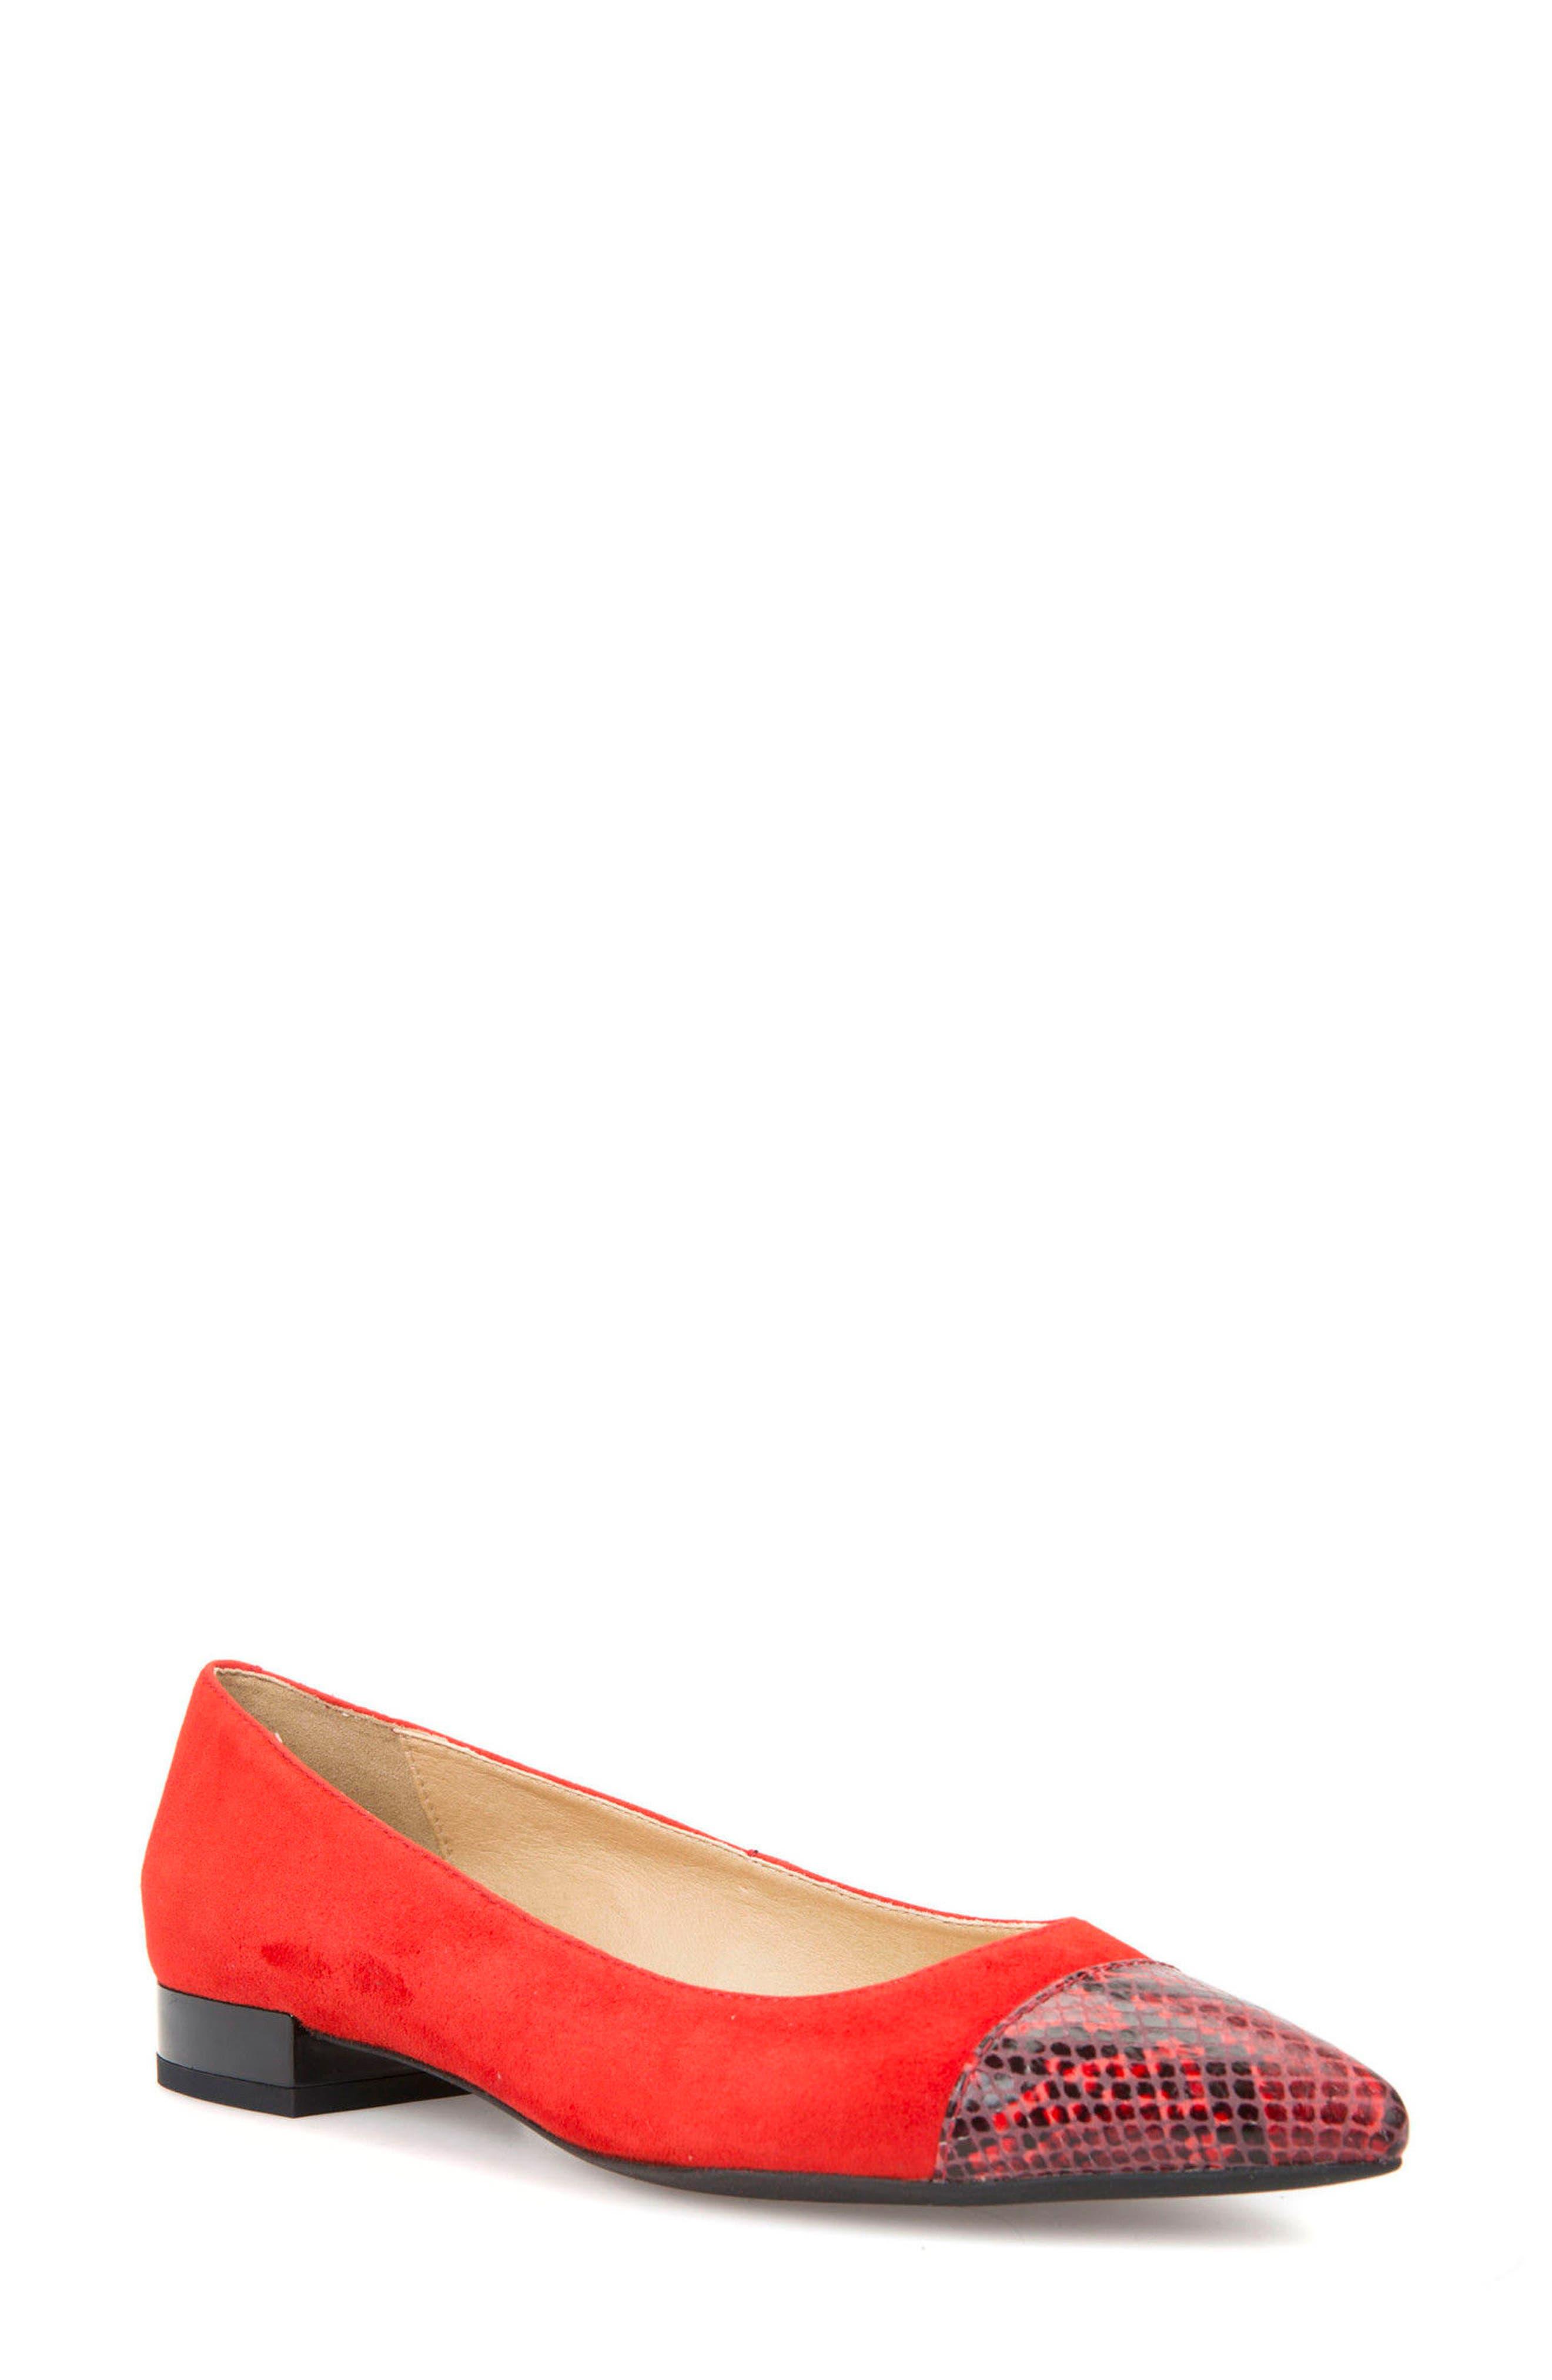 Charyssa Flat,                             Main thumbnail 1, color,                             Scarlet Leather